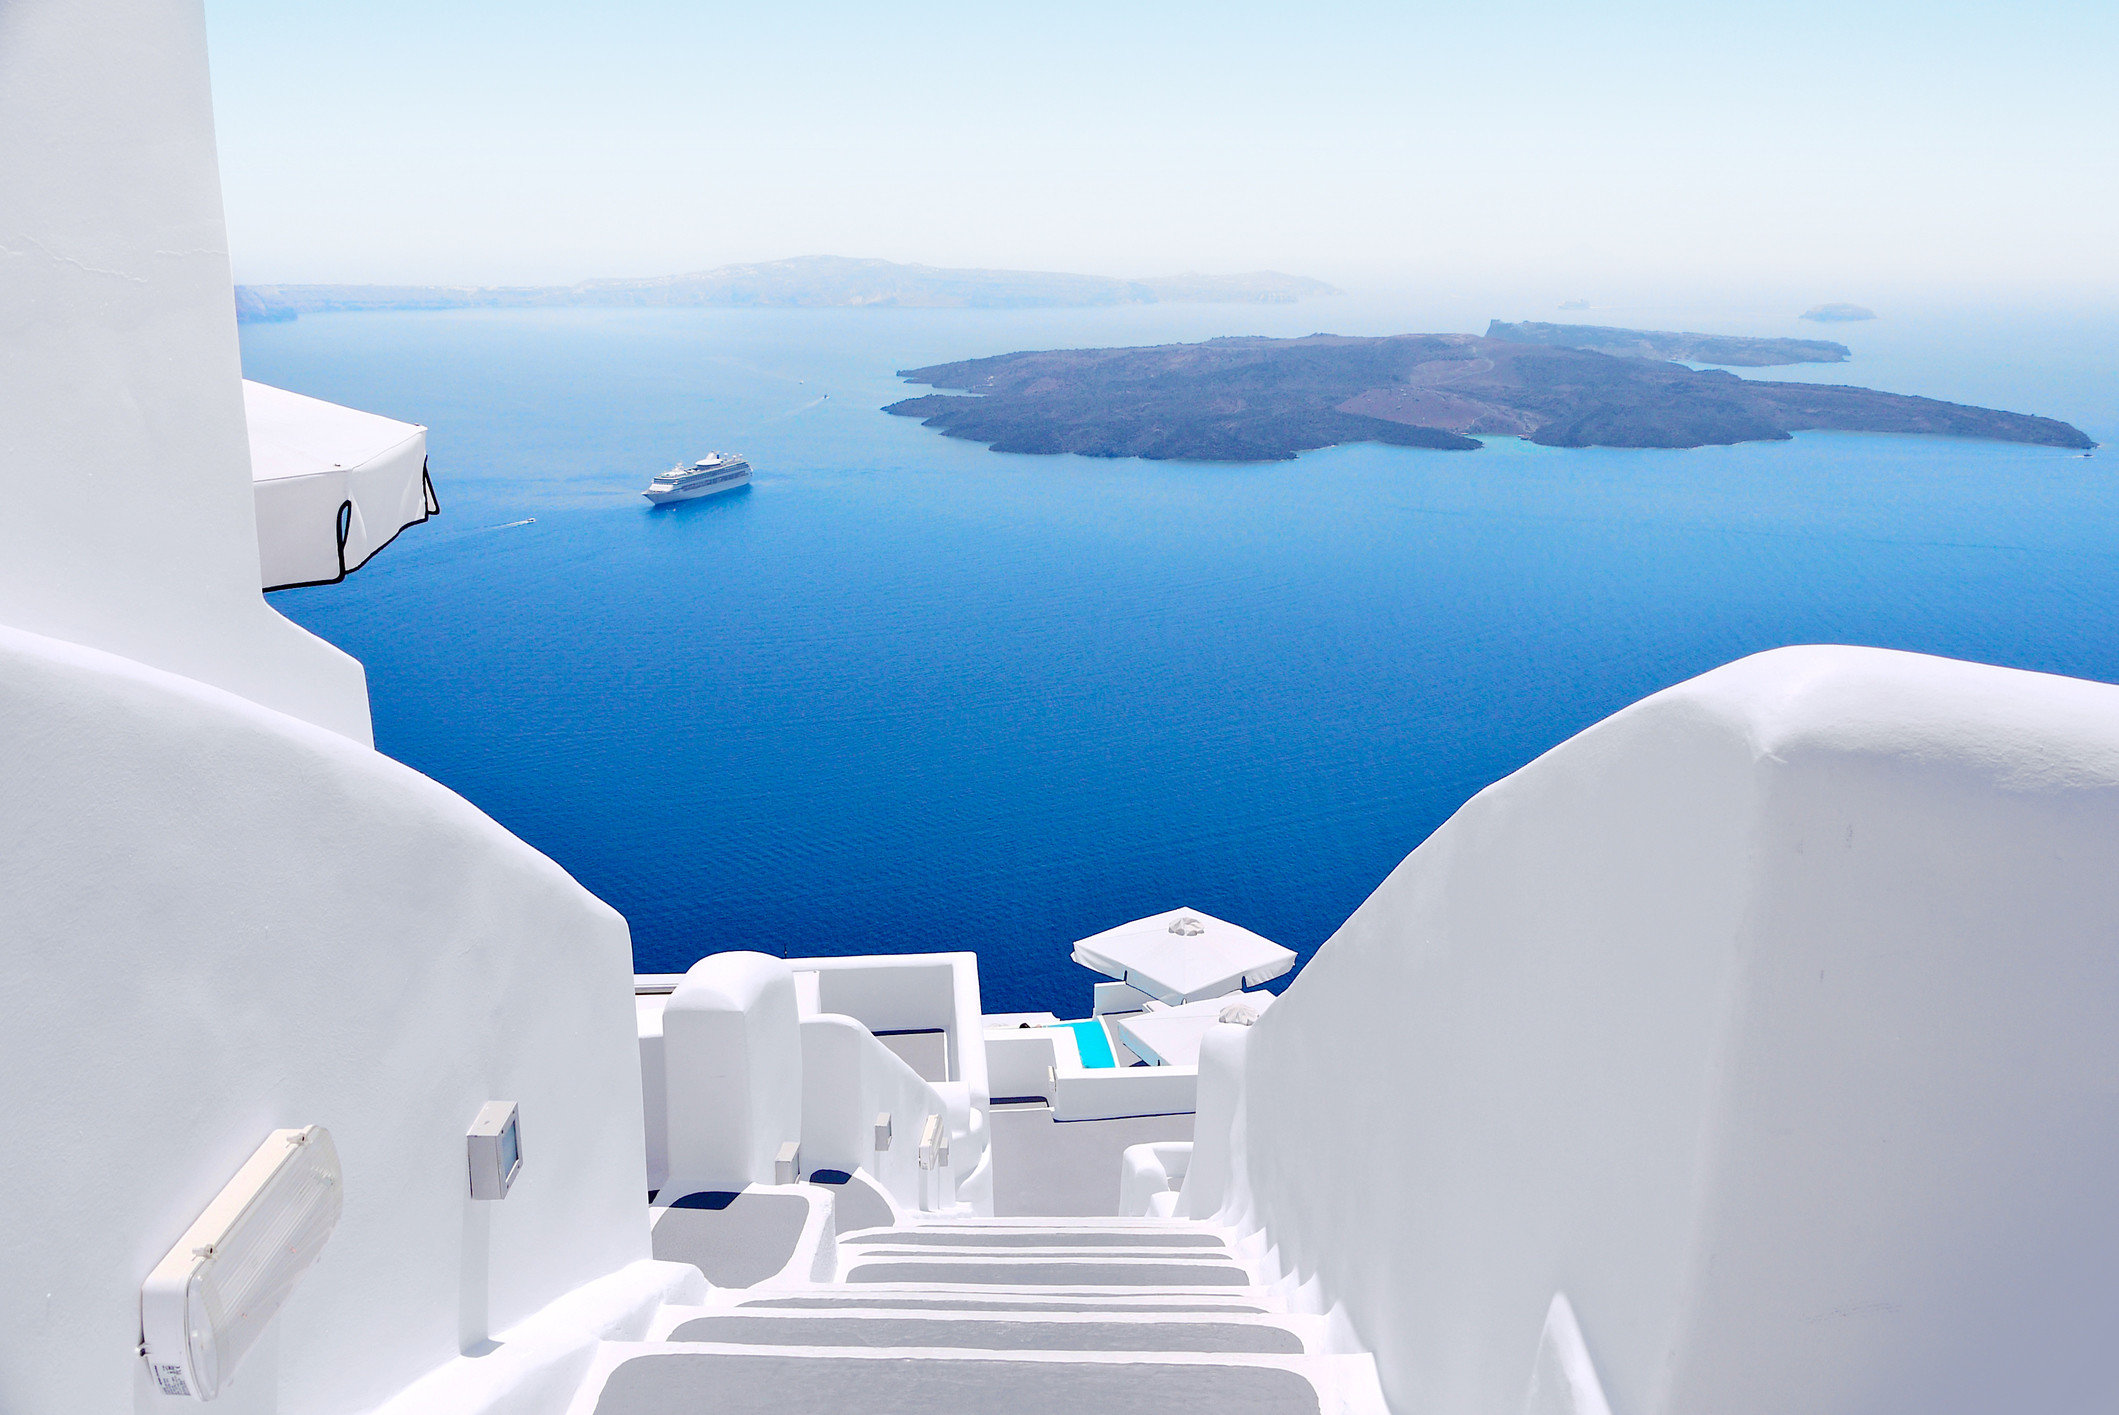 Romance Trip Ideas sky Nature water outdoor Sea coastal and oceanic landforms arctic vacation ice Ocean glacial landform